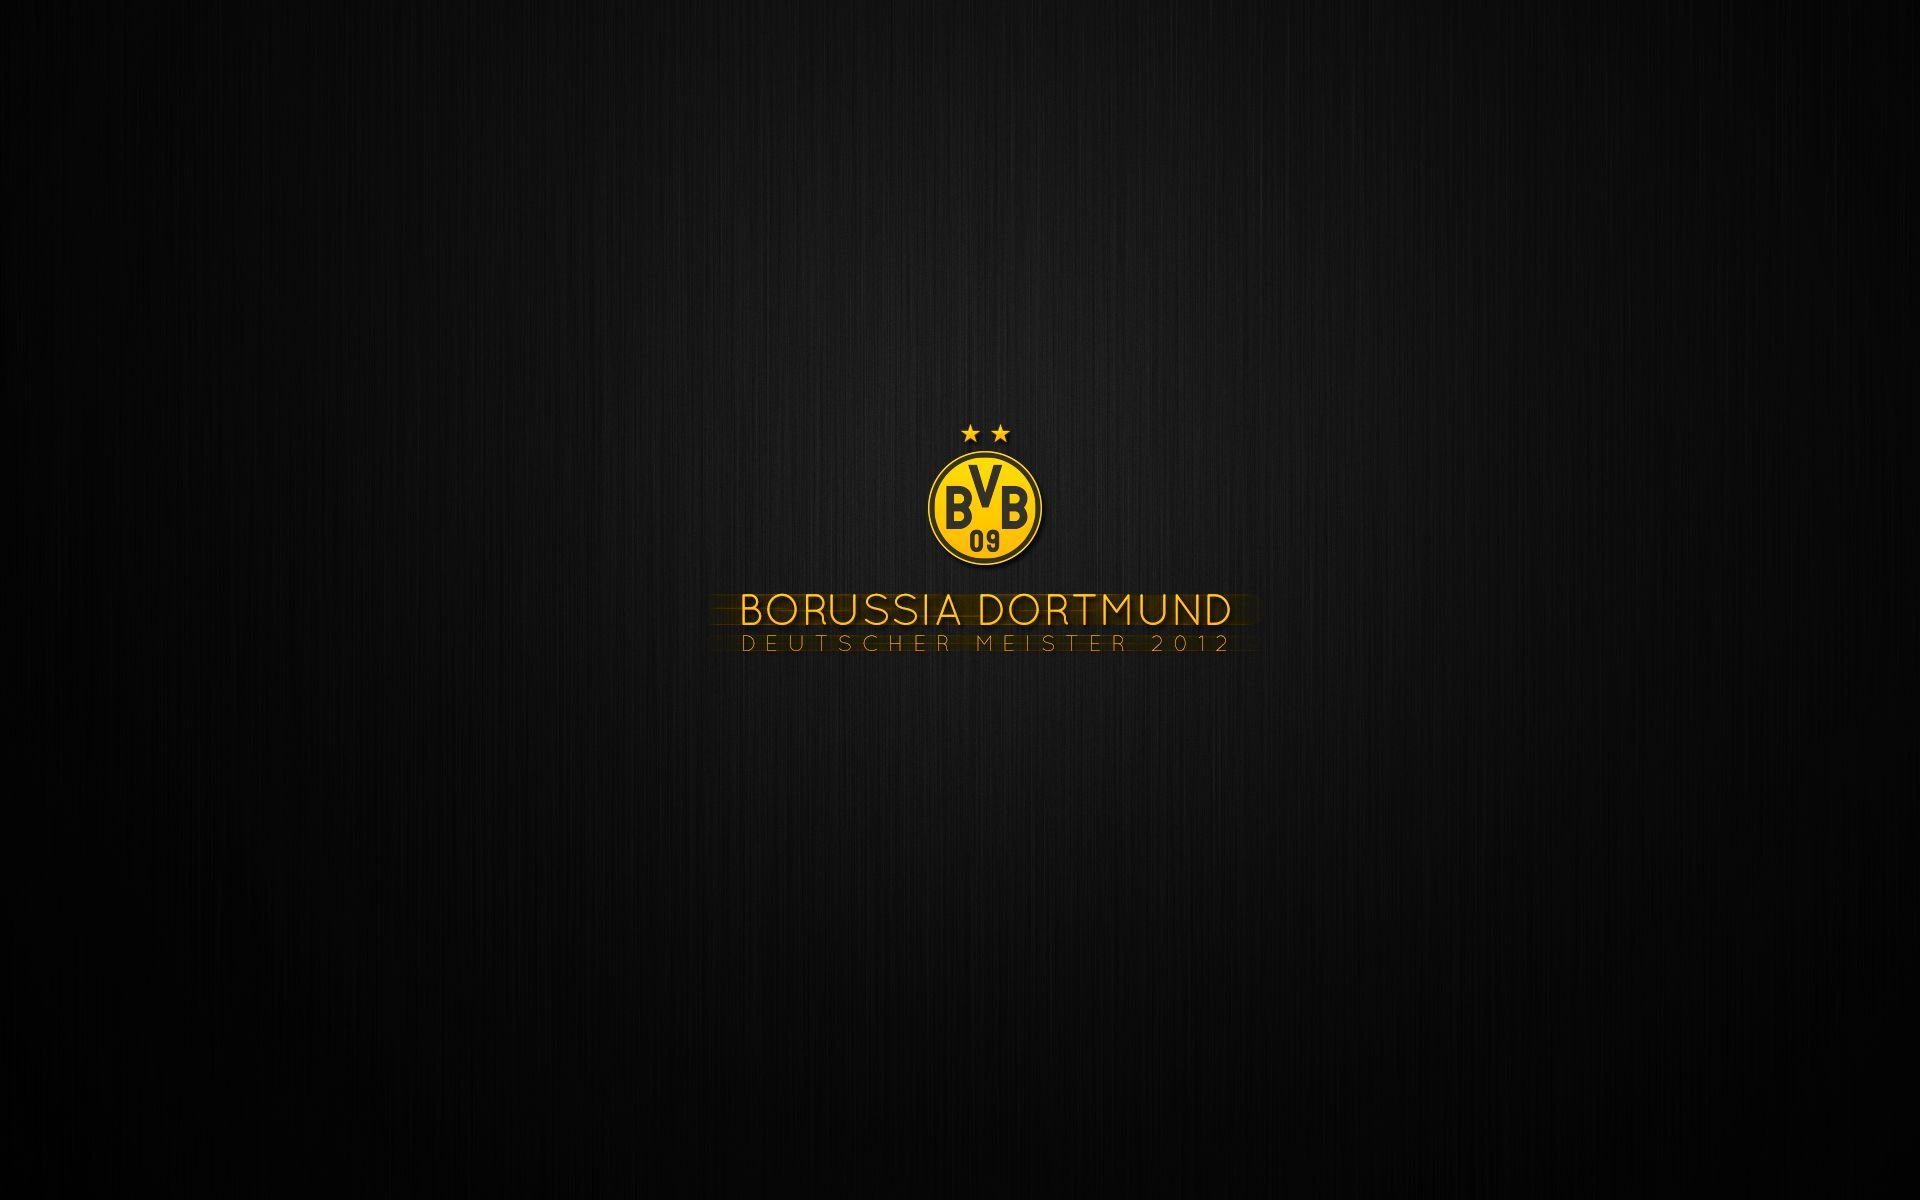 Image for Borussia Dortmund Fans Wallpaper Desktop Background 1920x1200